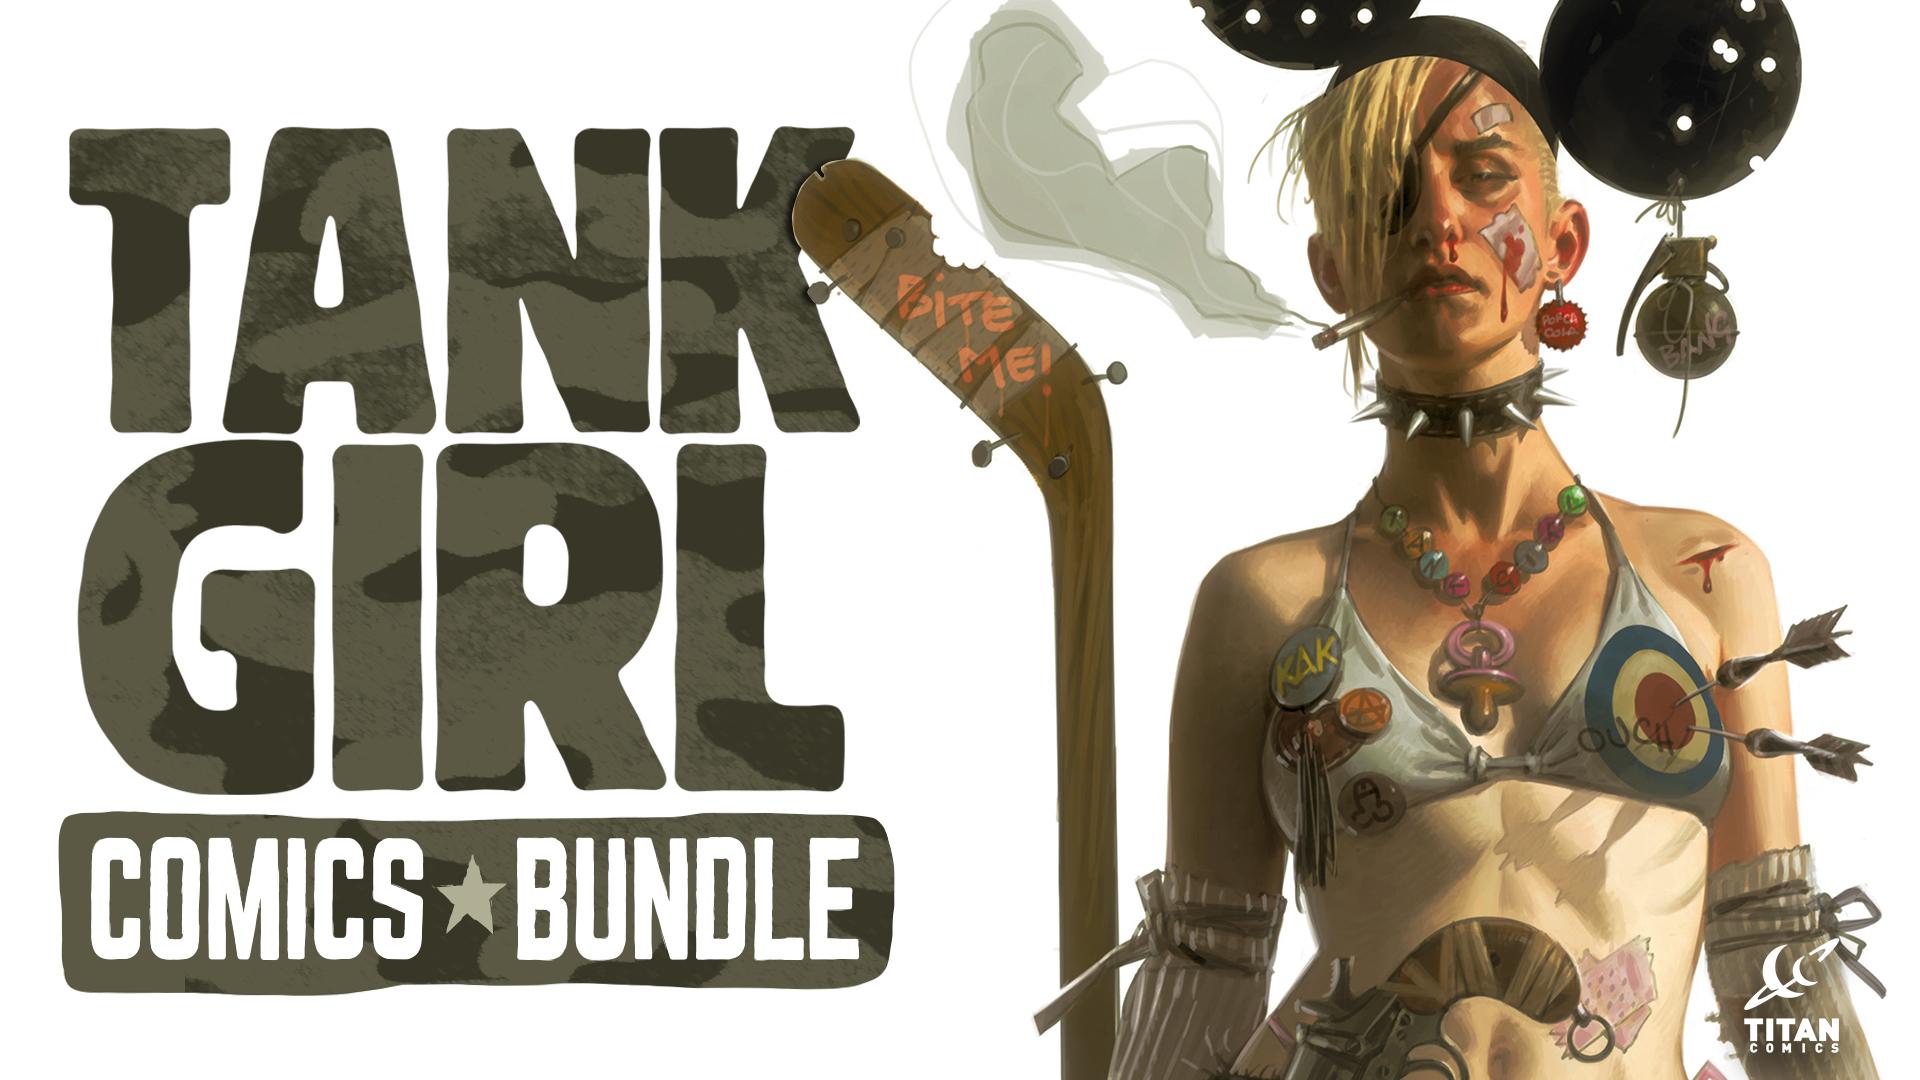 Tank Girl Comics Bundle Presented By Titan Comics Game Bundle